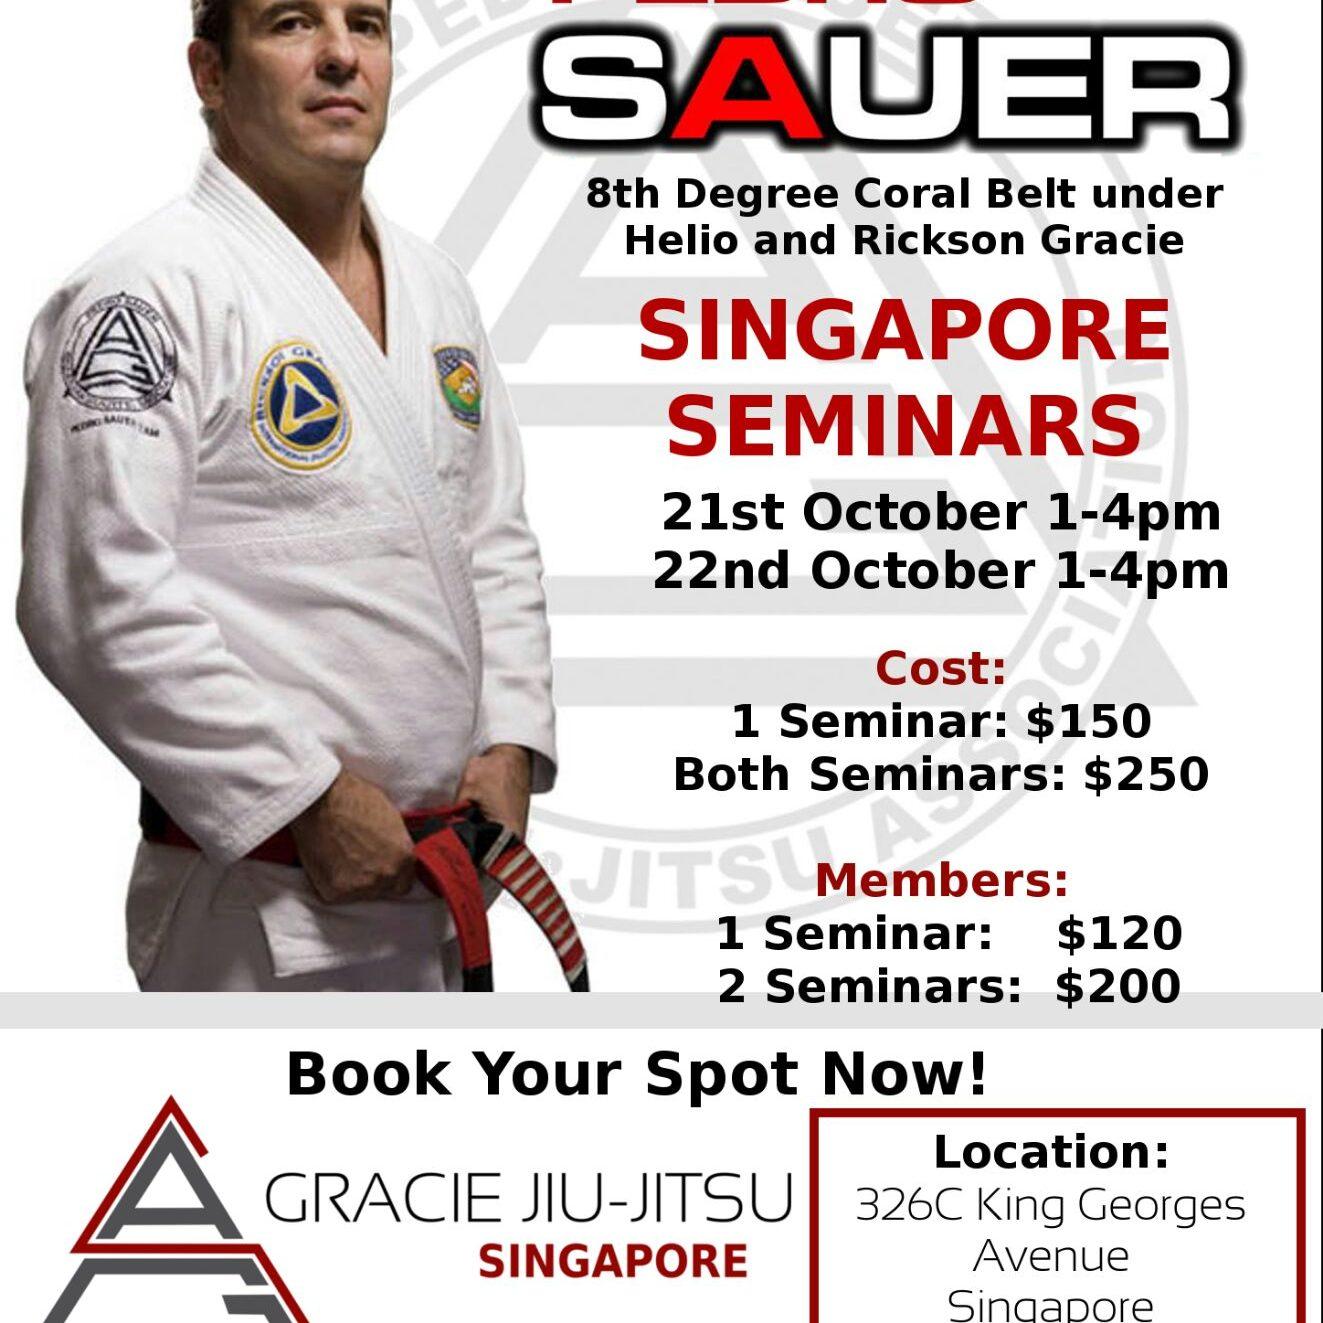 Pedro Sauer Seminar 2017